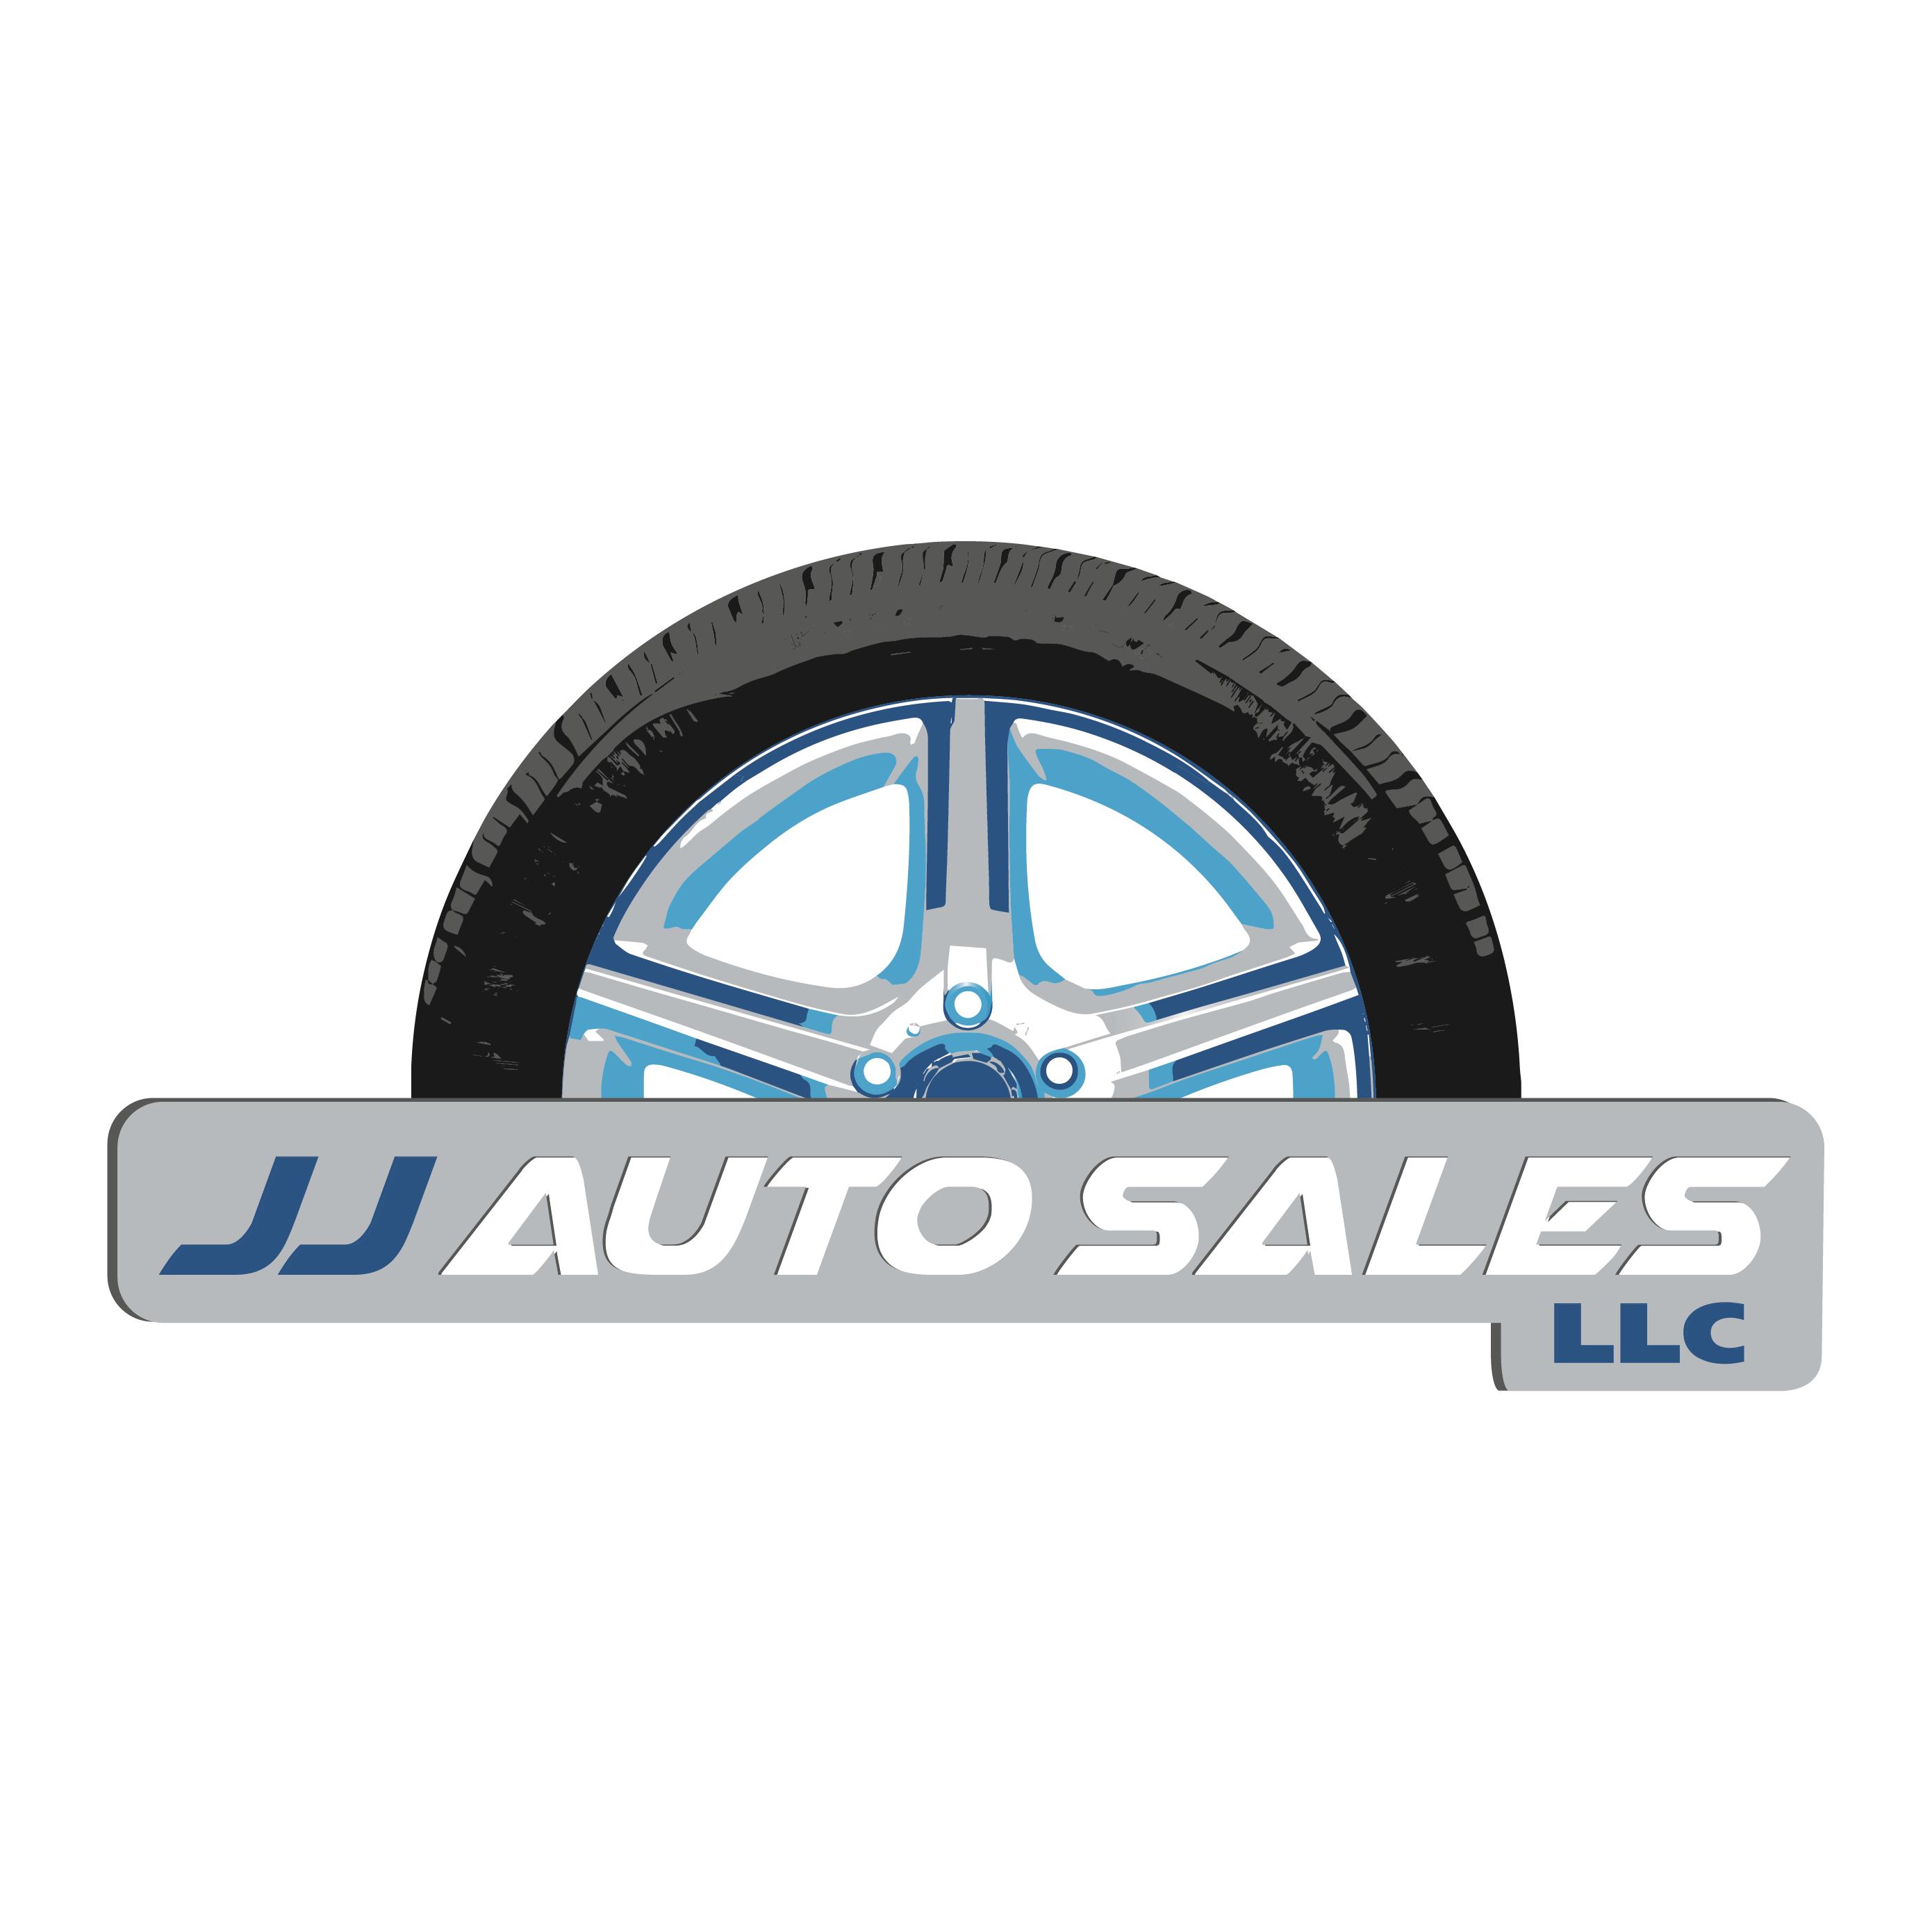 Jj Auto Sales